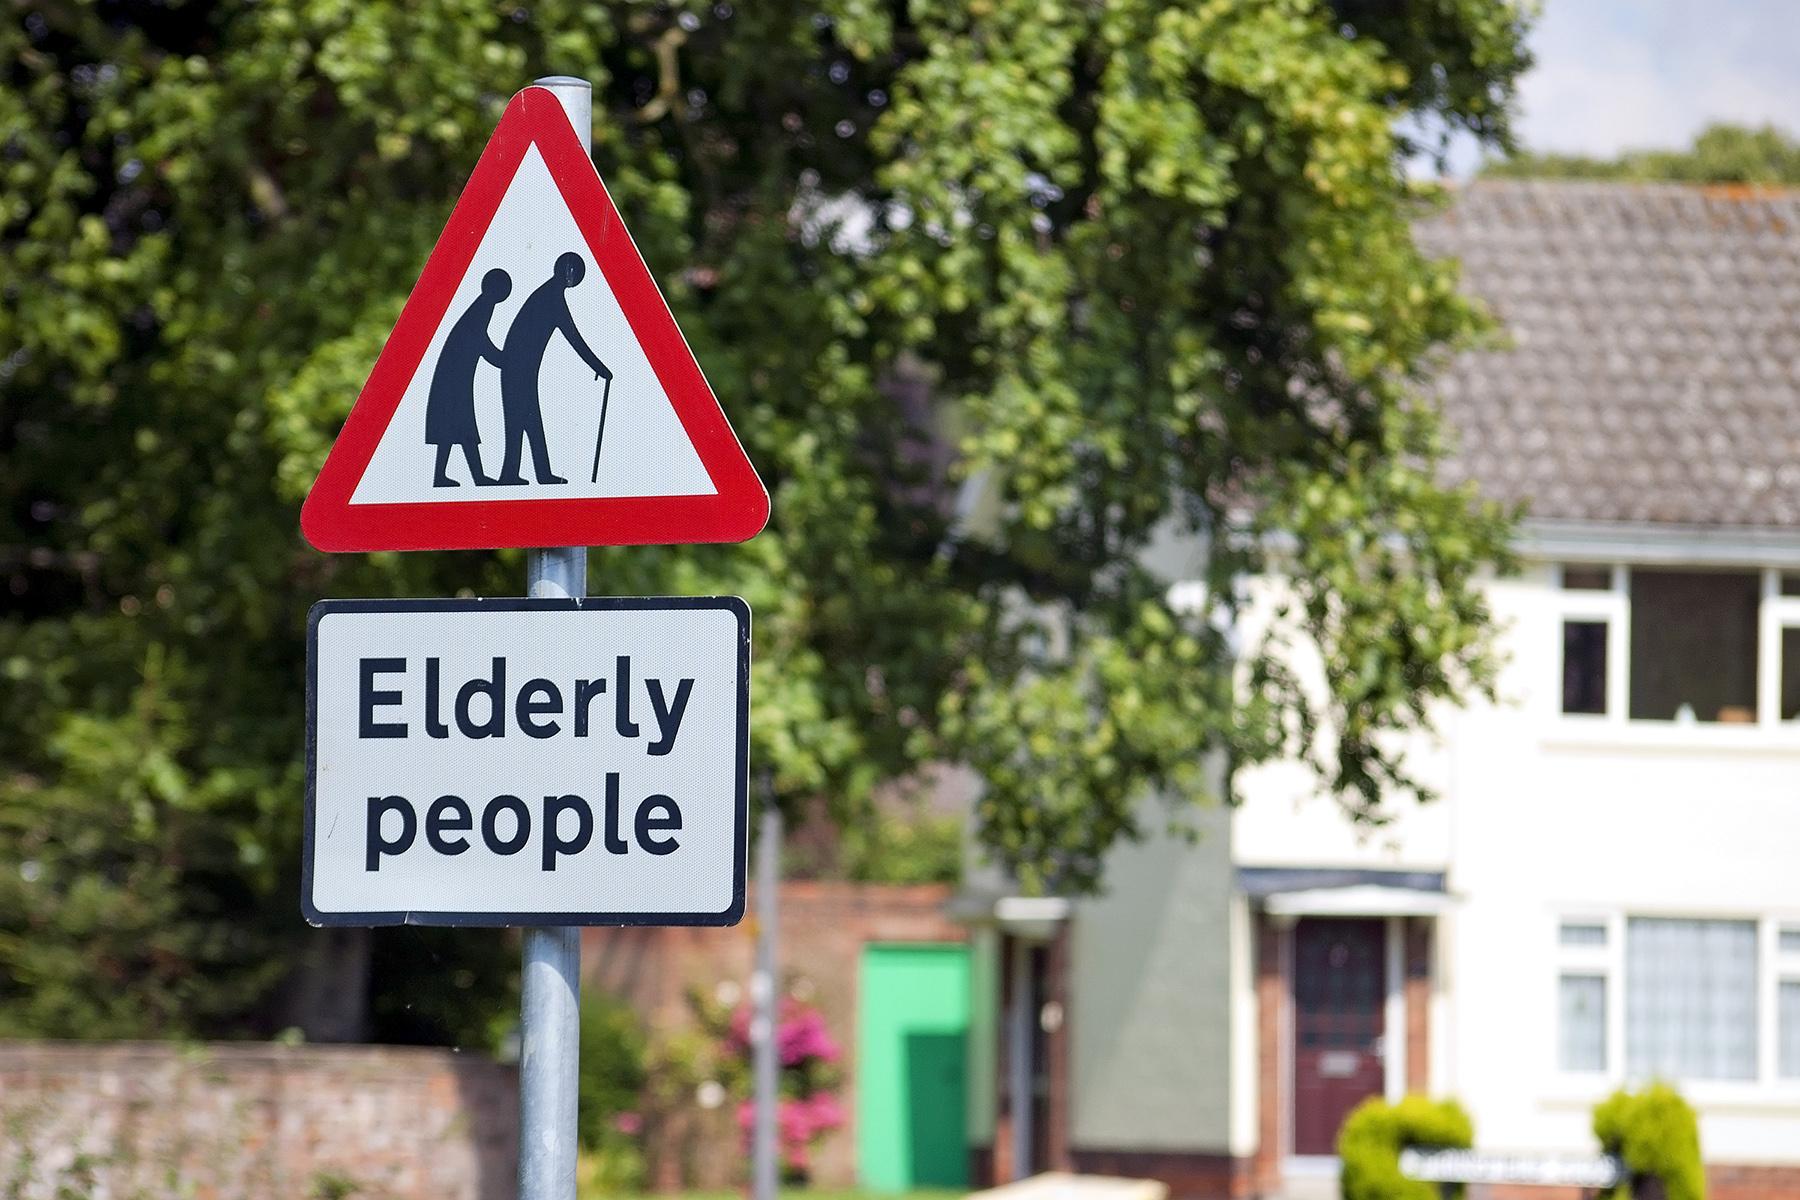 Elderly people road sign in England